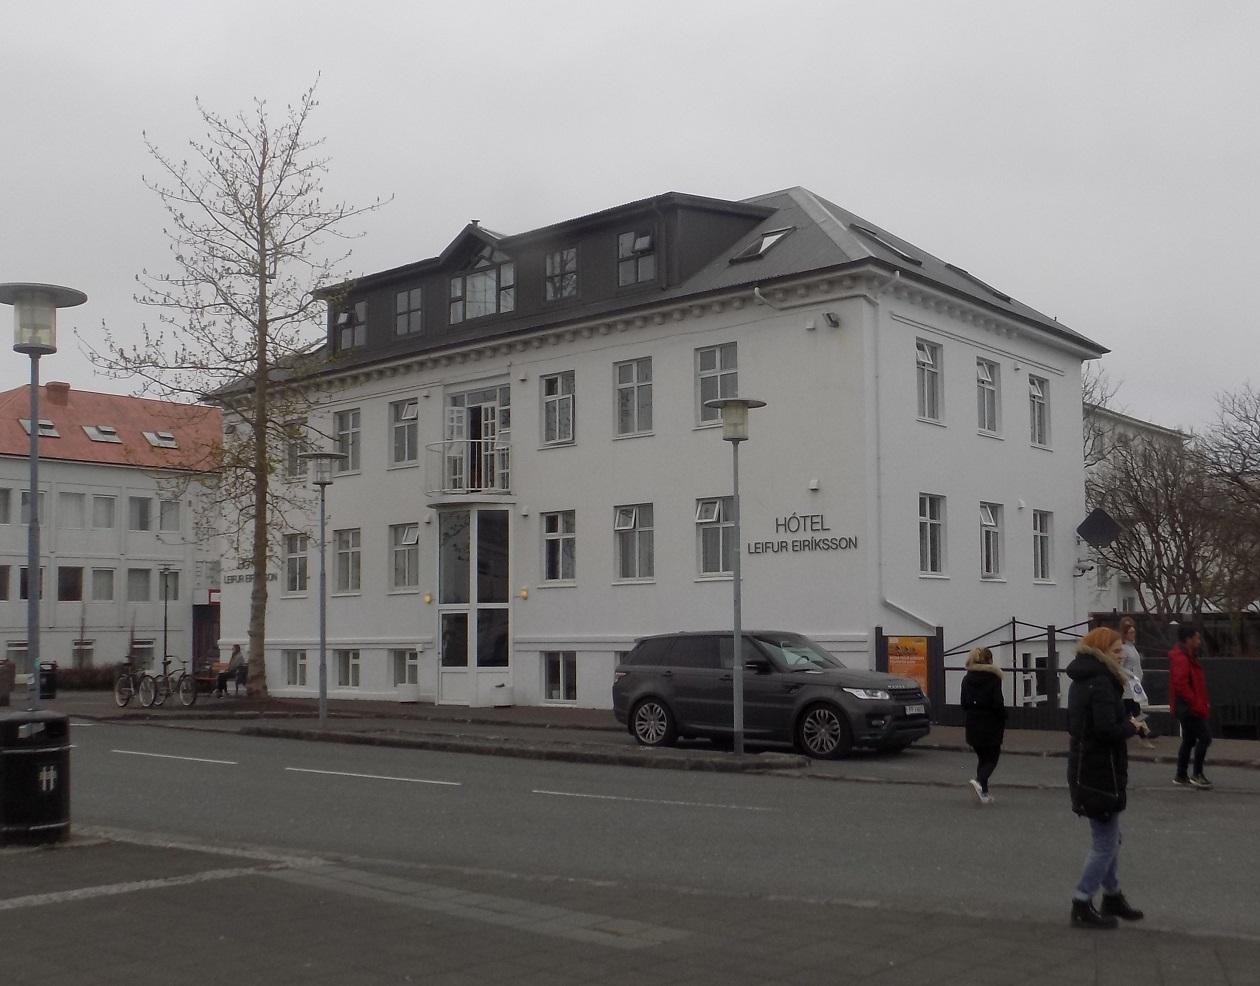 The Hotel Leifur Eriksson, Reykjavik